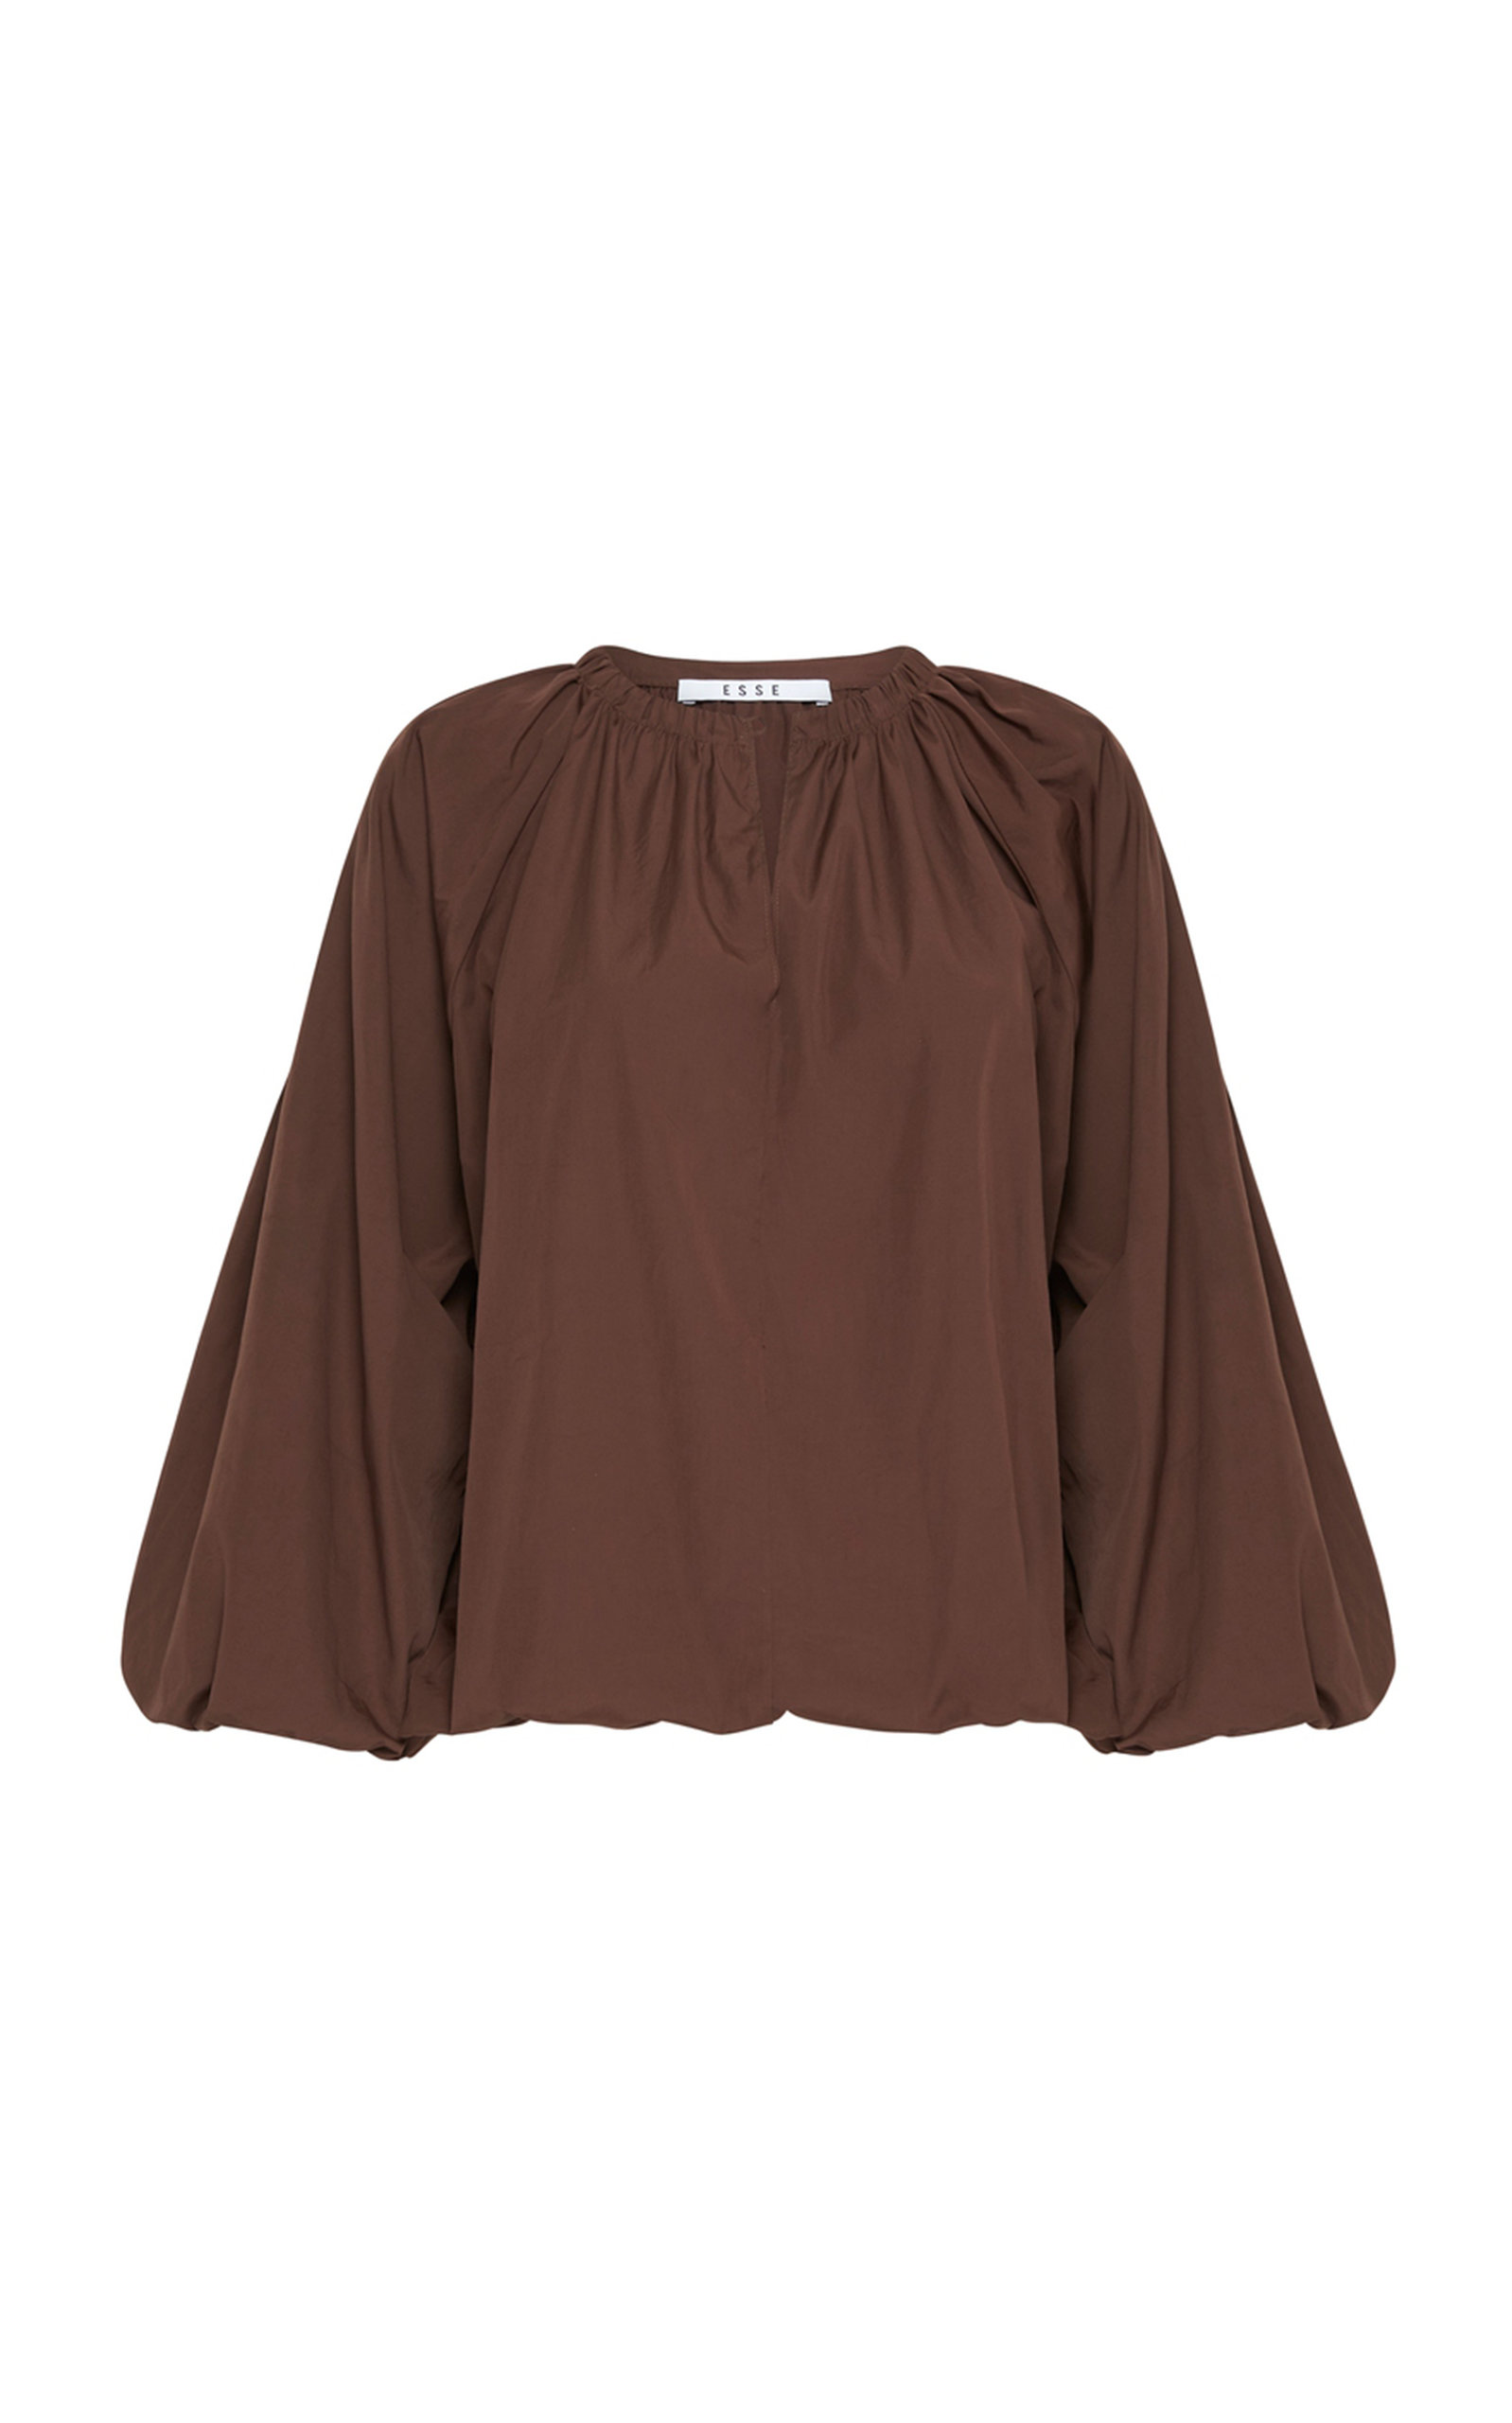 Women's Puff-Sleeve Cotton Top